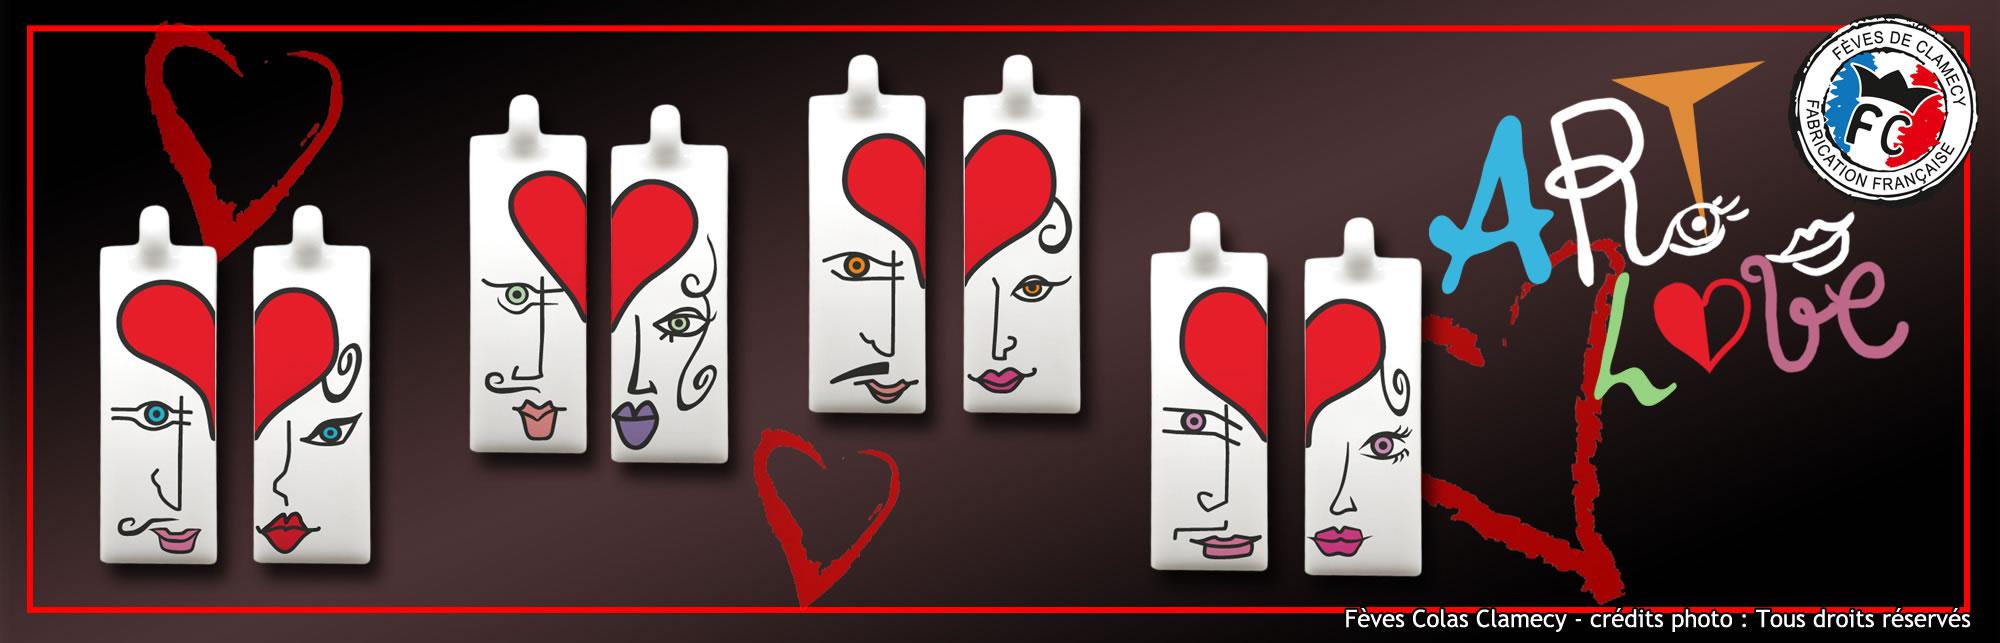 Slider-Fèves-de-Clamecy-Art-Love